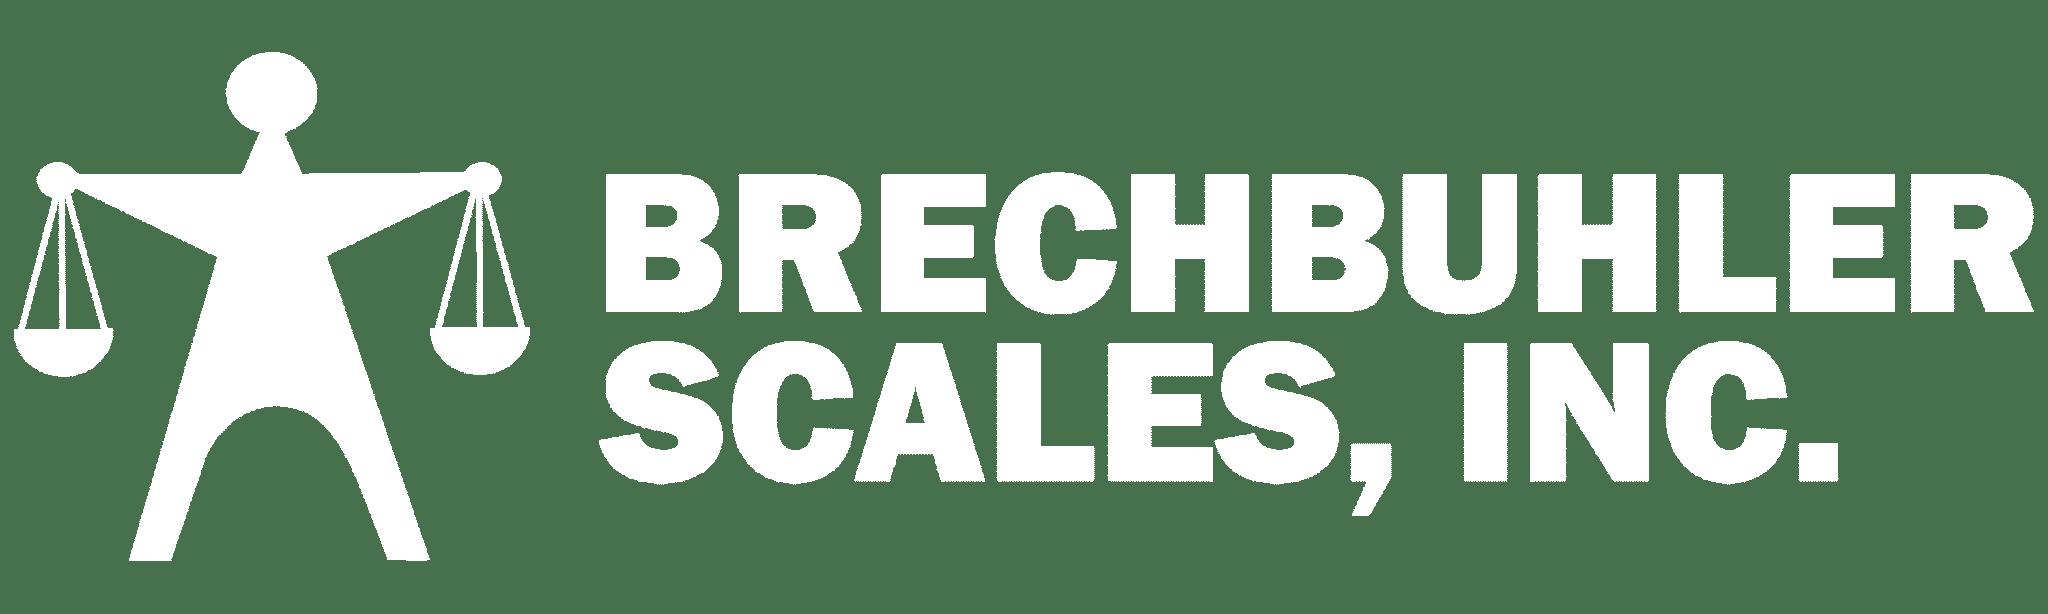 Brechbuhler Scales Inc Logo